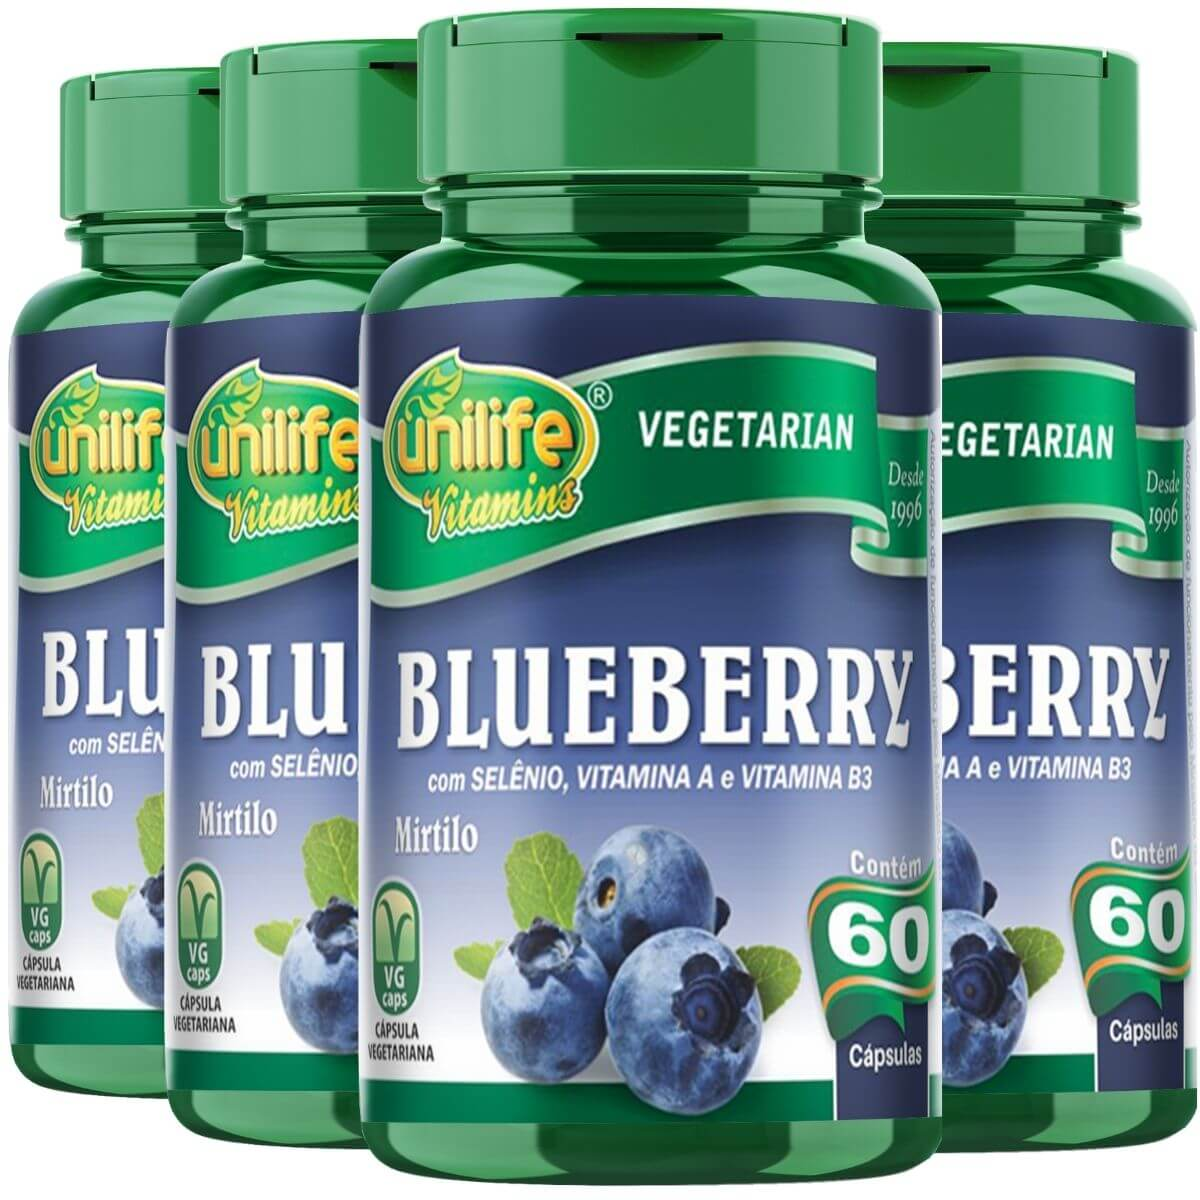 Kit 4 Blueberry Mirtilo Antioxidante Unilife - 550 Mg 60 Cápsulas